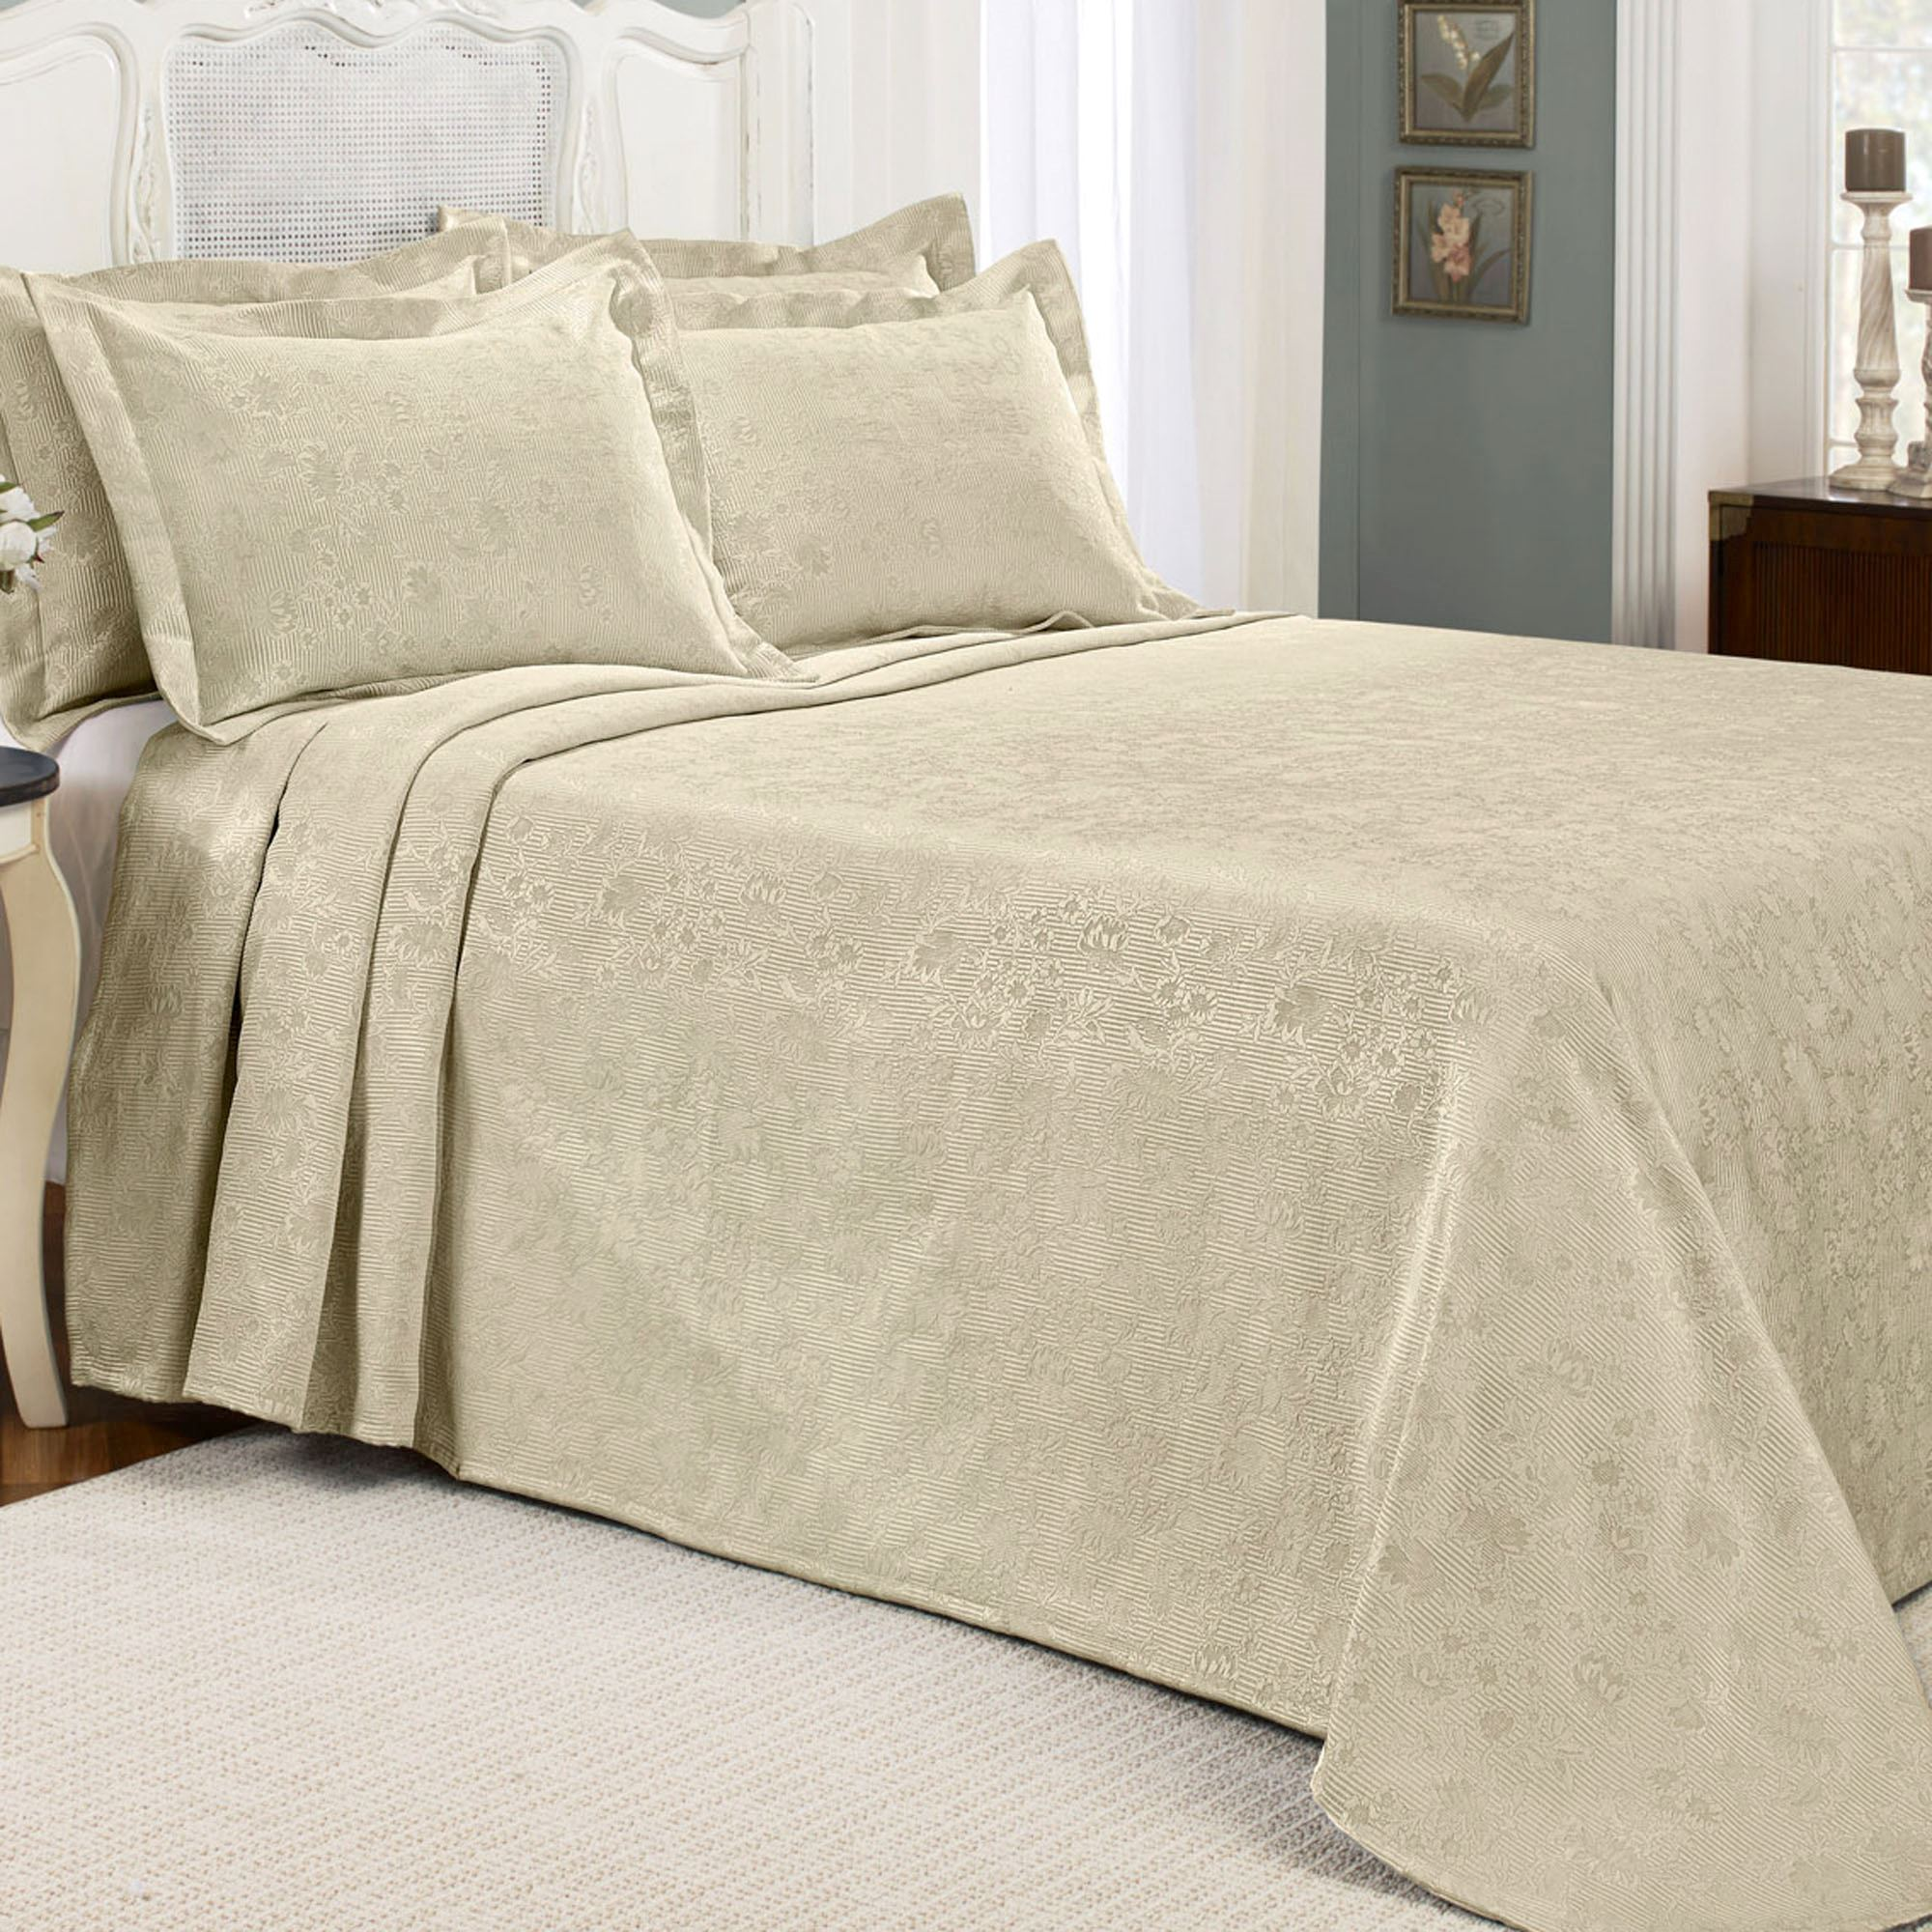 Claire Floral Matelasse Bedspread Bedding